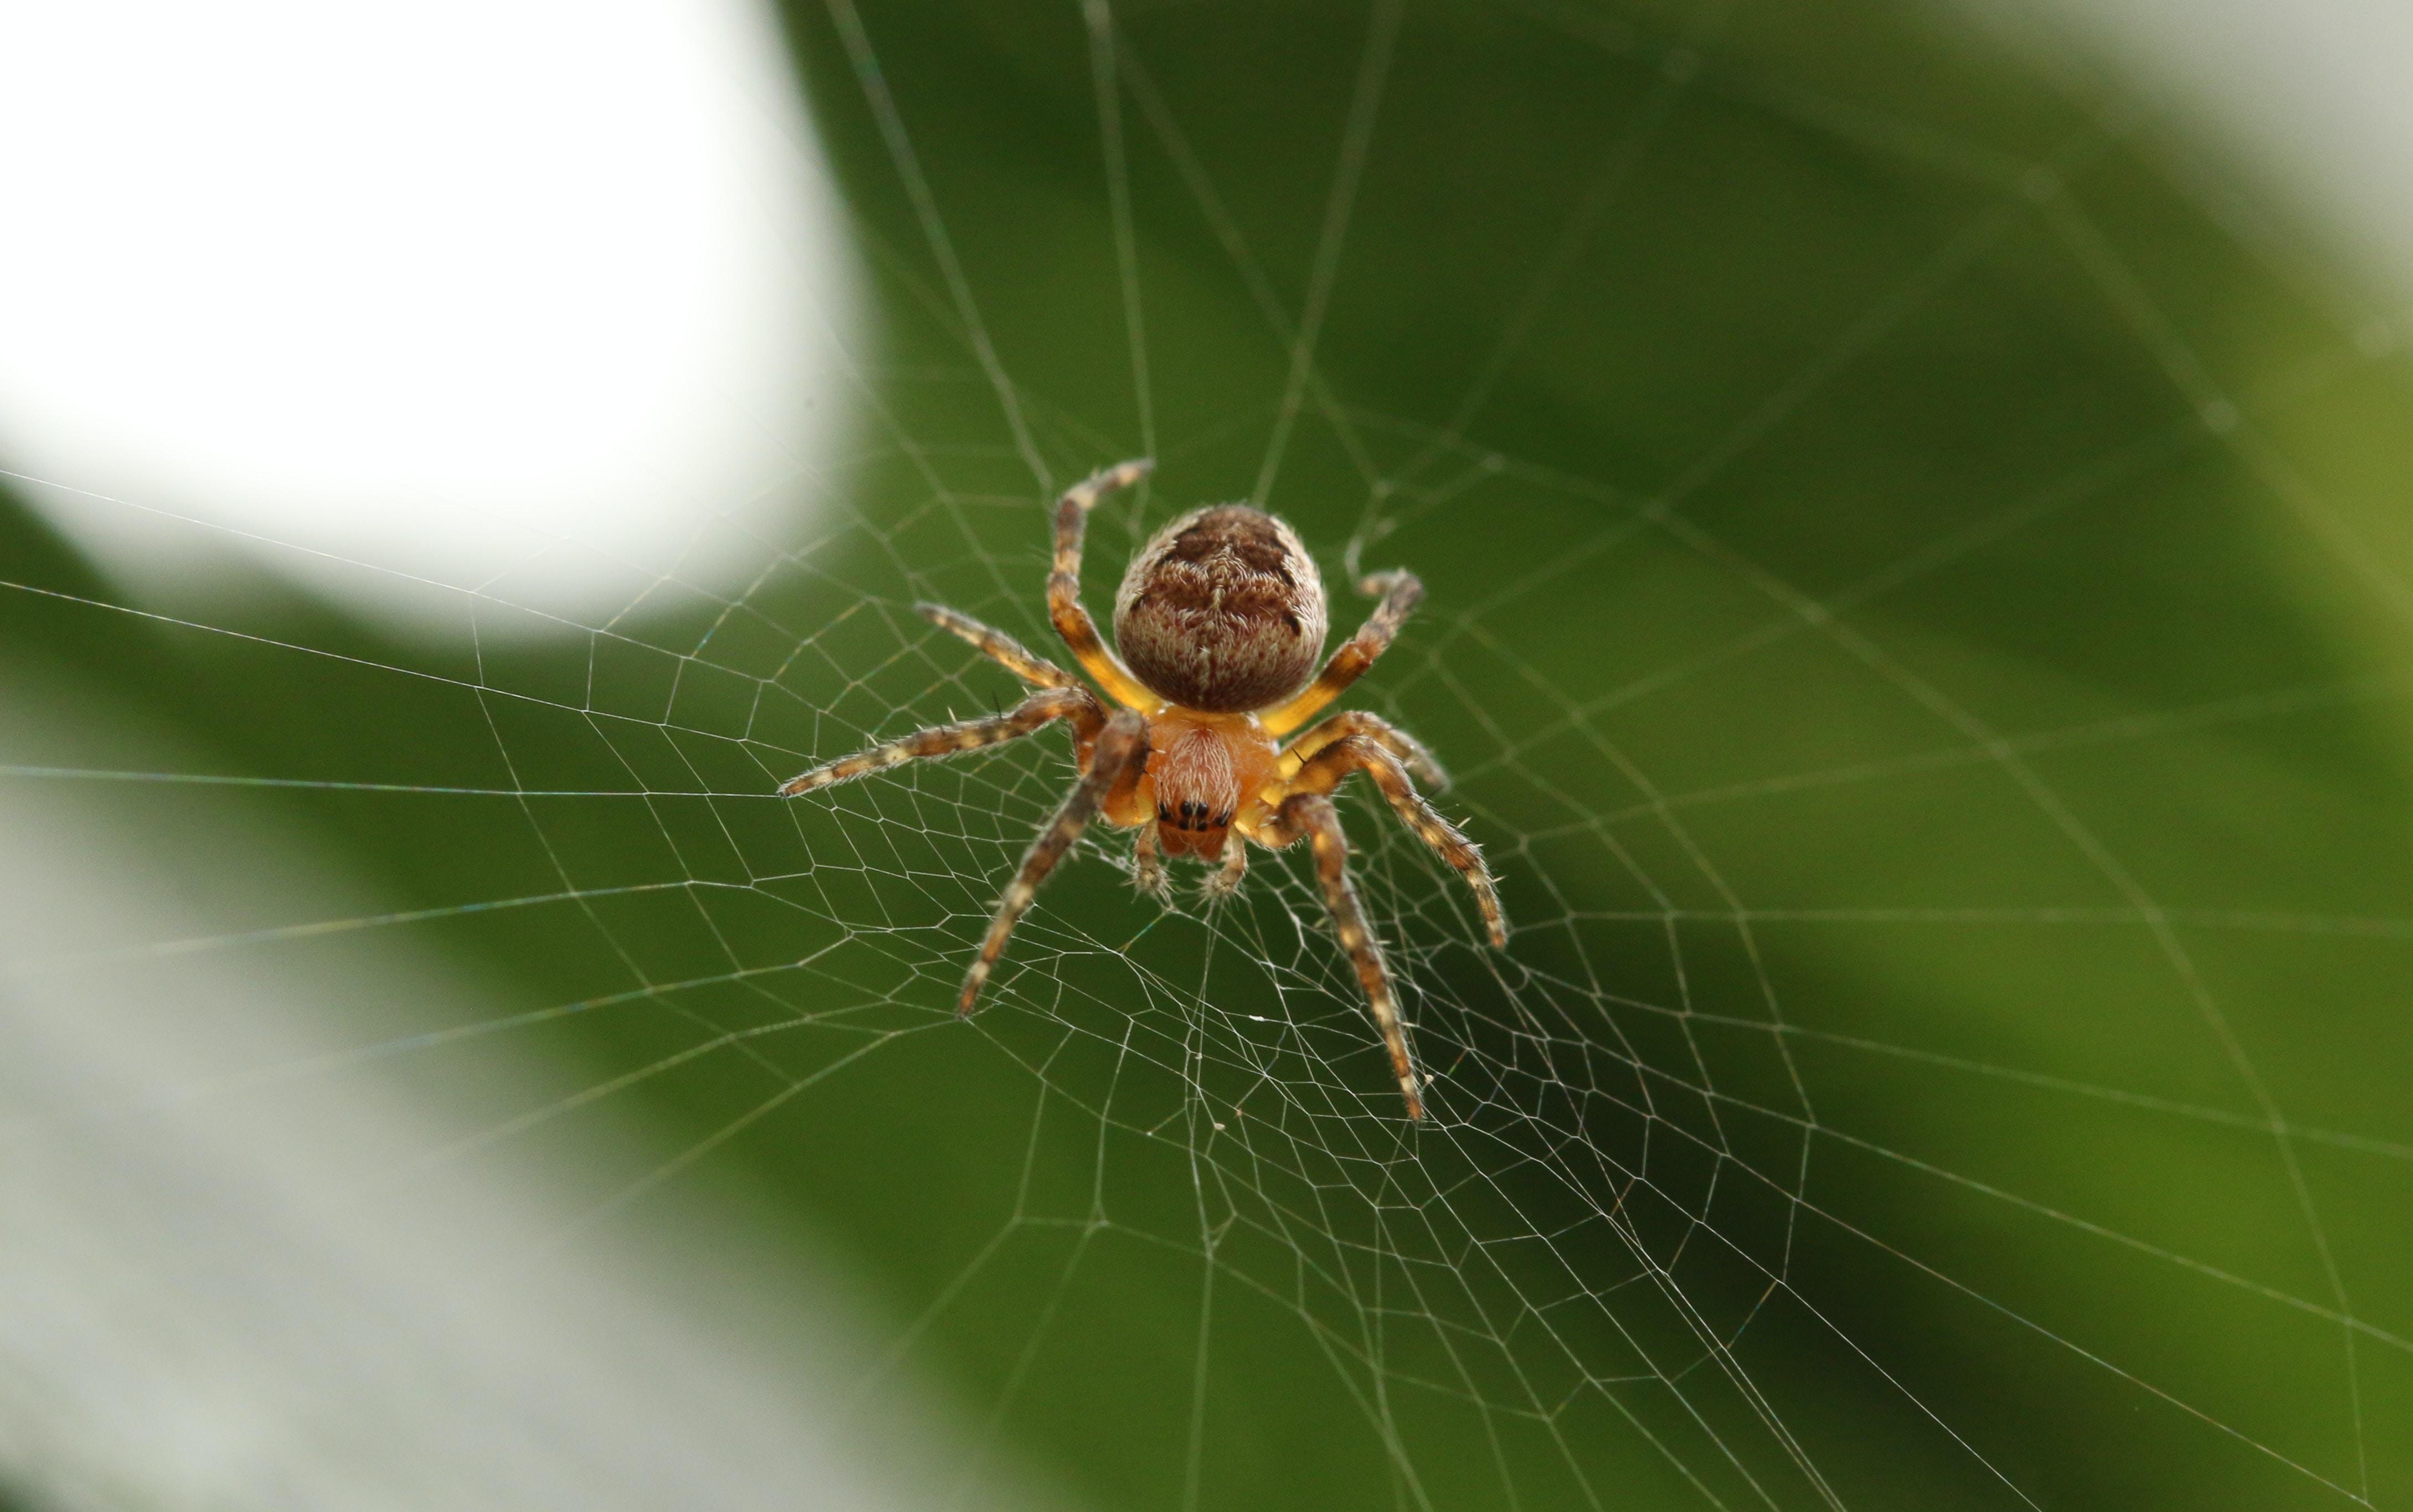 barn spider on cobweb closeup photography